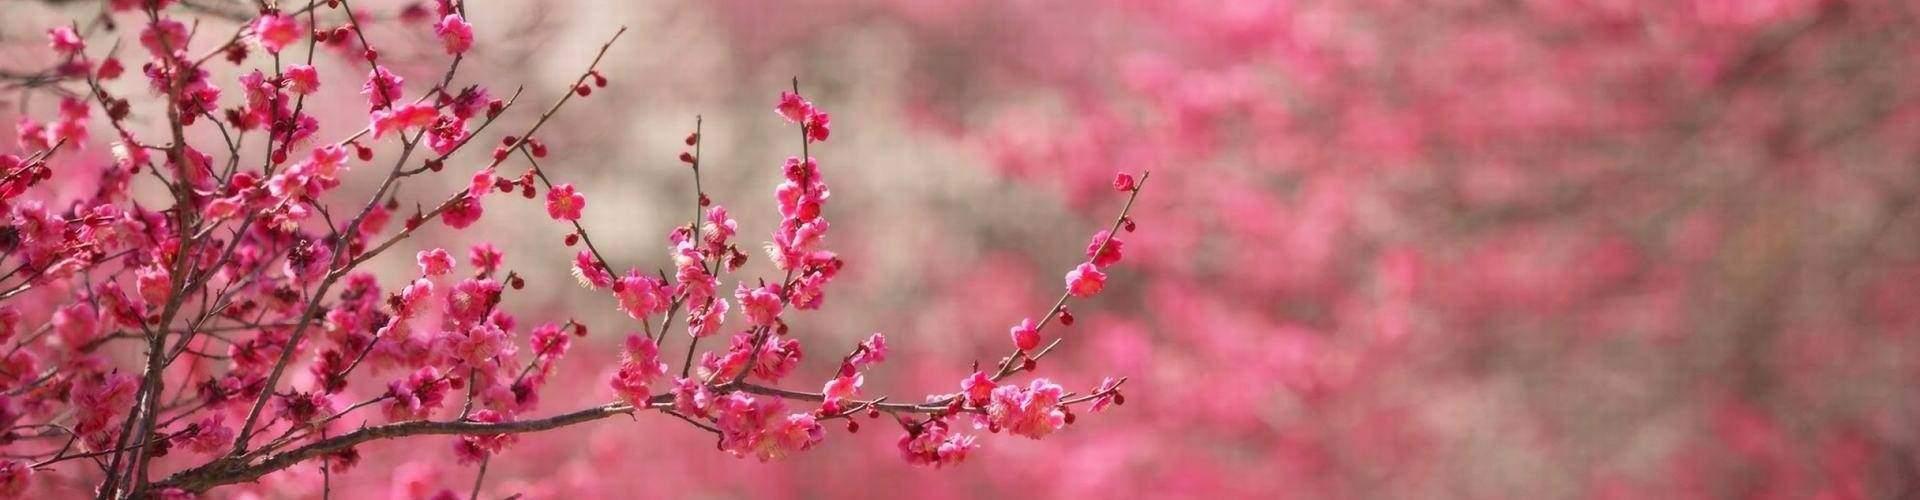 cherry blossom vietnamcherry blossom vietnam